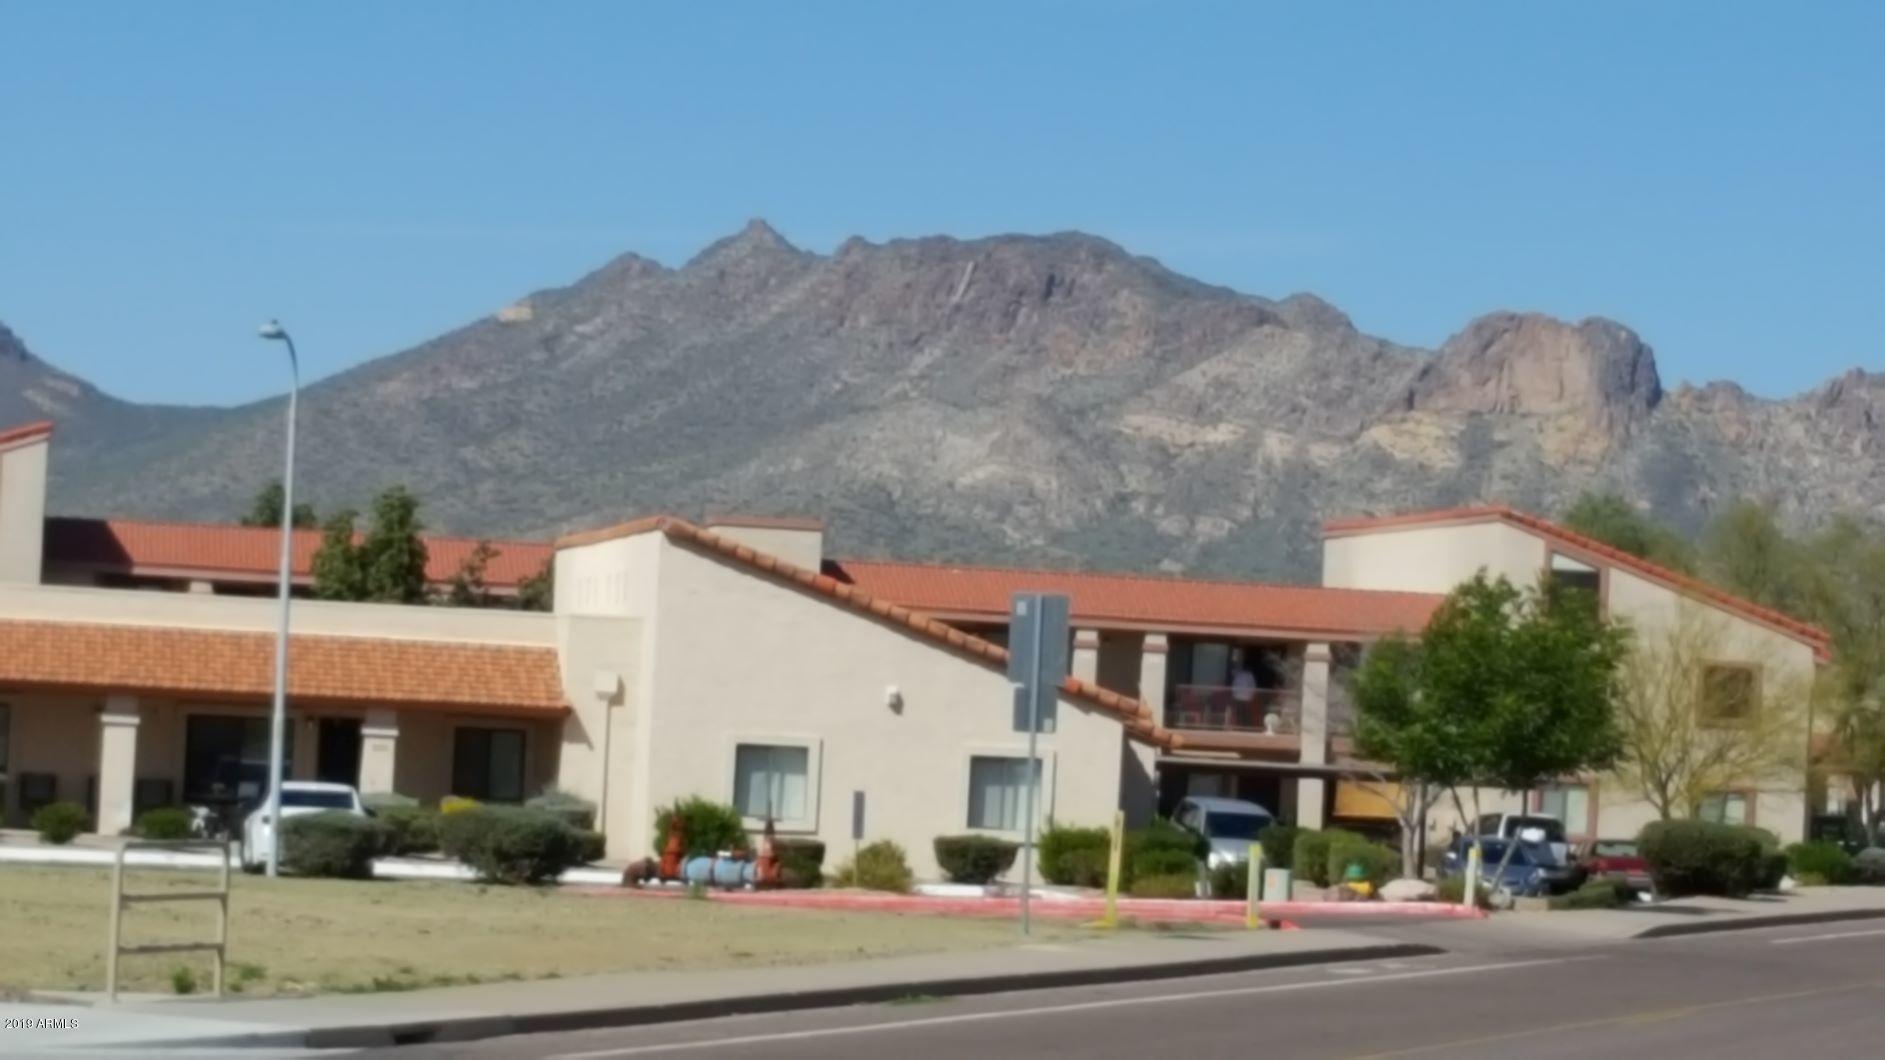 MLS 5892654 1440 N IDAHO Road Unit 1101 Building 9, Apache Junction, AZ 85119 Apache Junction AZ Condo or Townhome